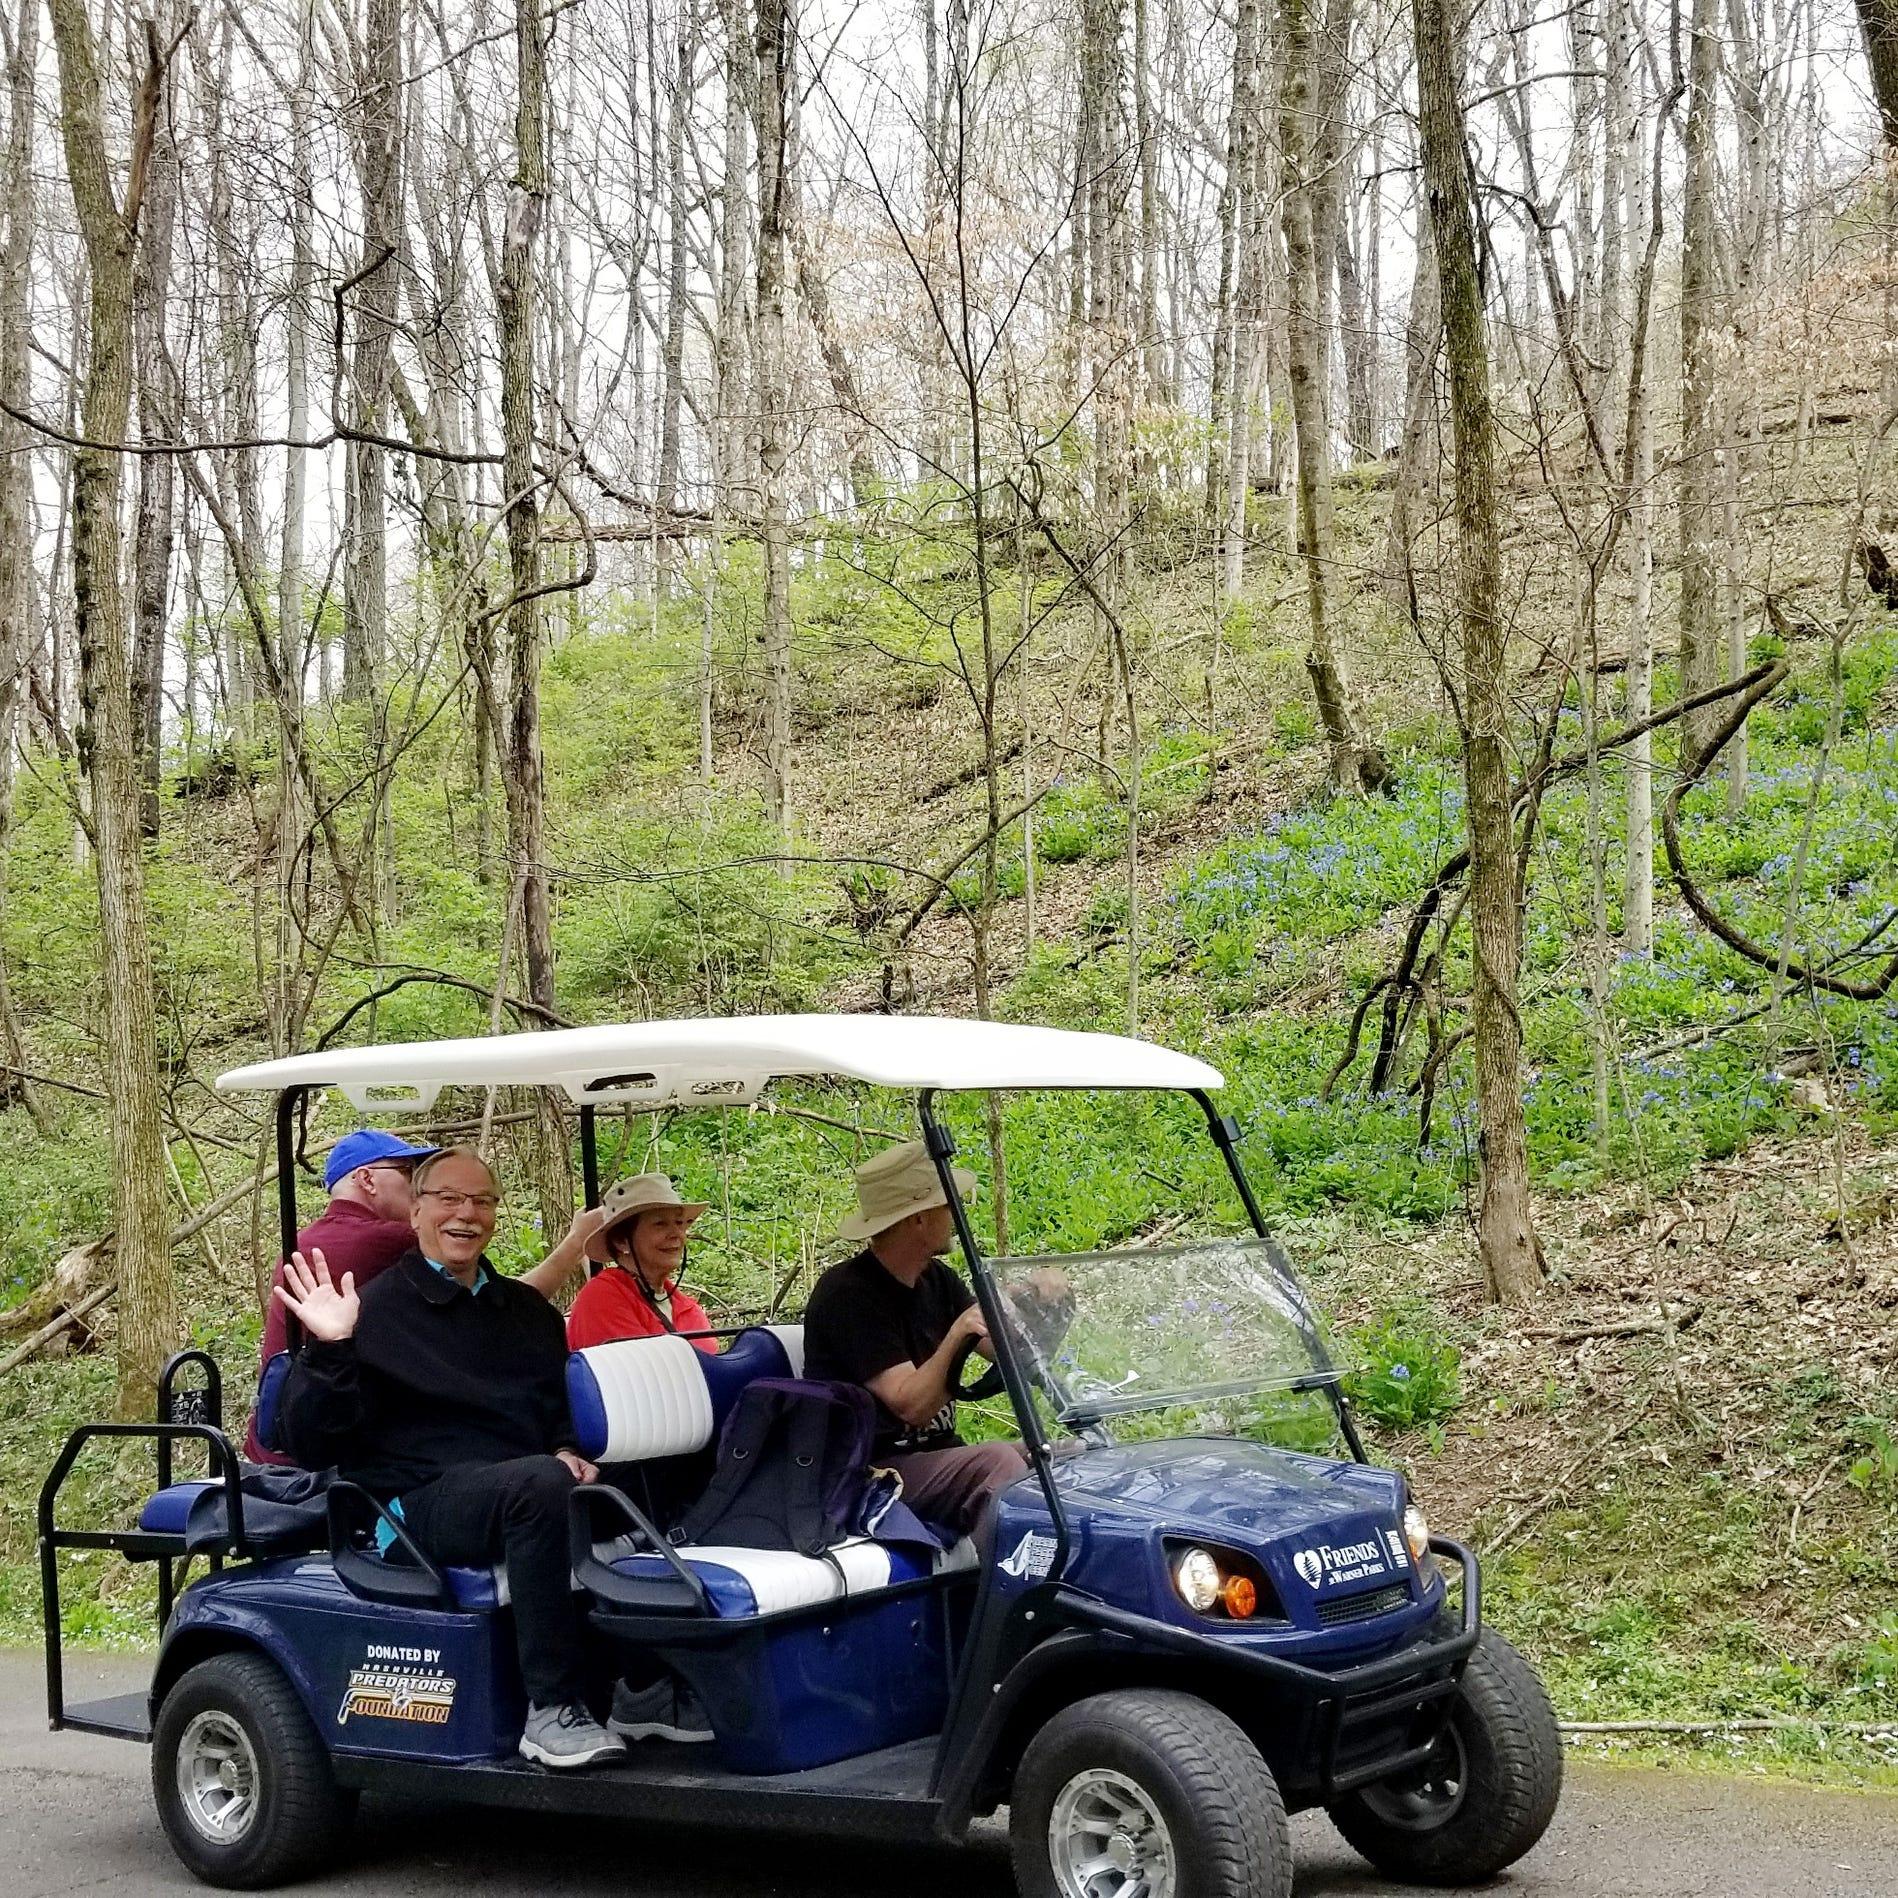 Your bargain weekend: art crawls, 'Alice in Wonderland' and Warner Park golf cart tours